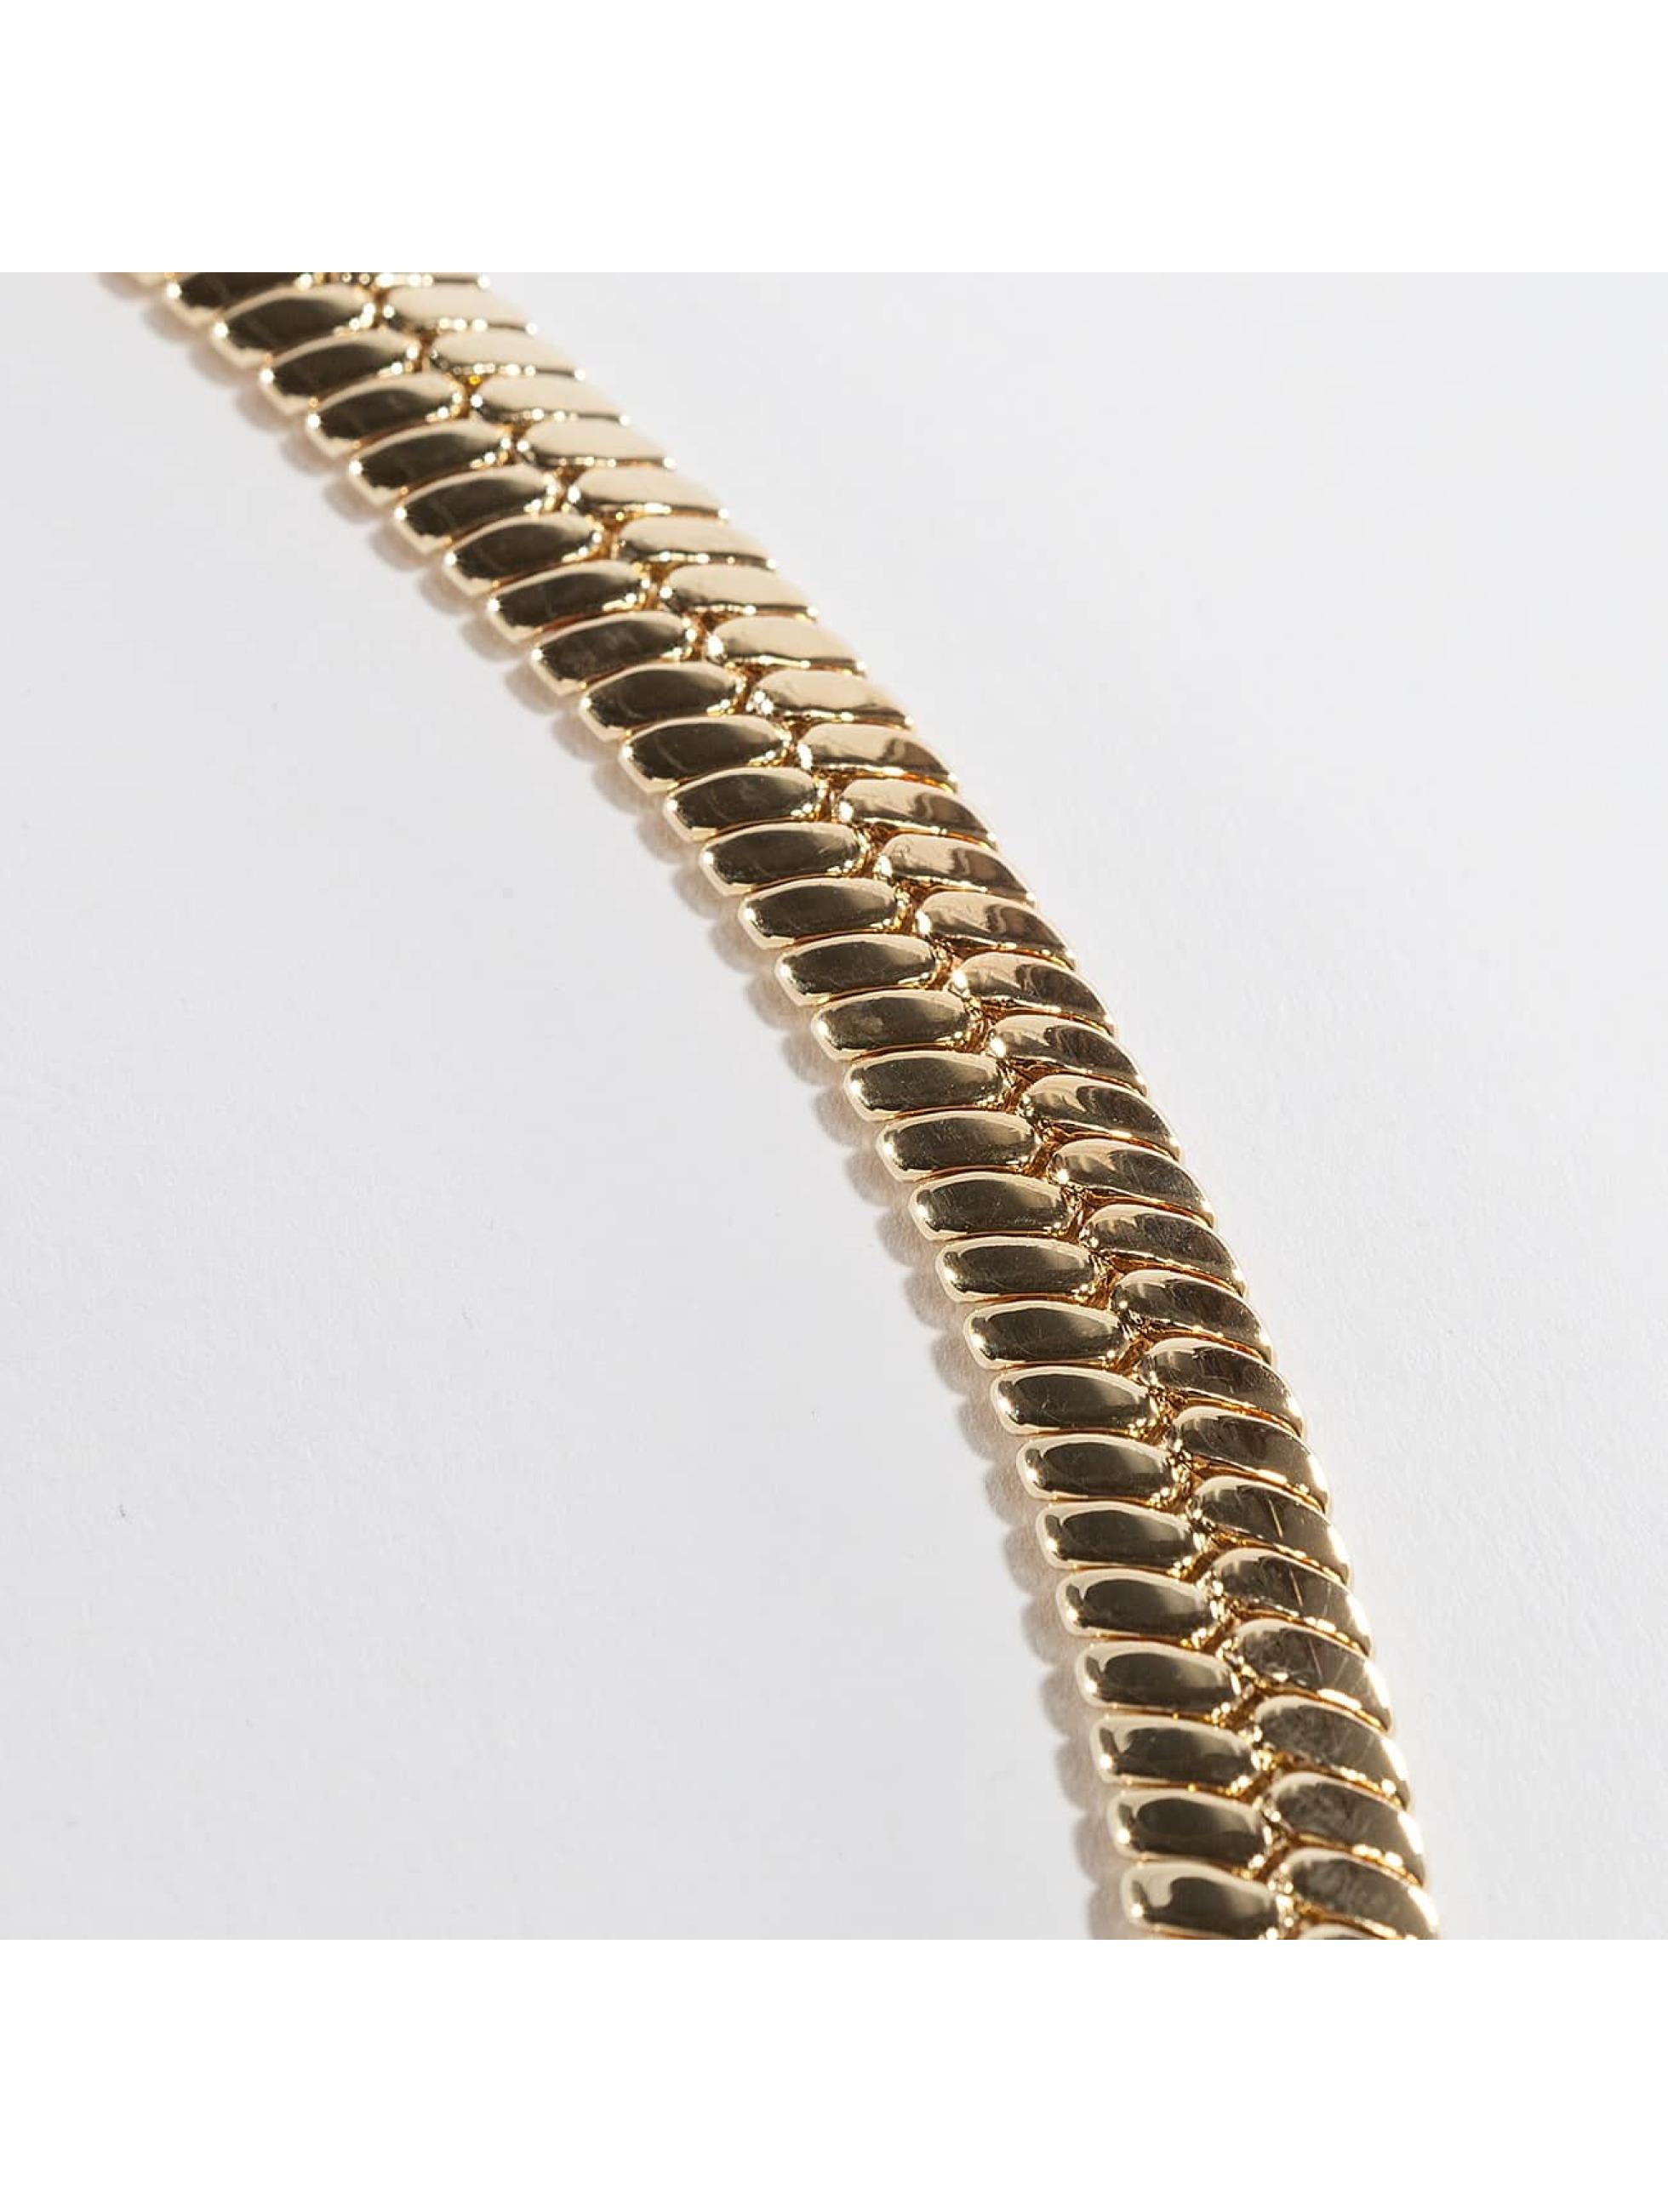 KING ICE Retiazky Gold_Plated 10mm Thick Herringbone zlatá